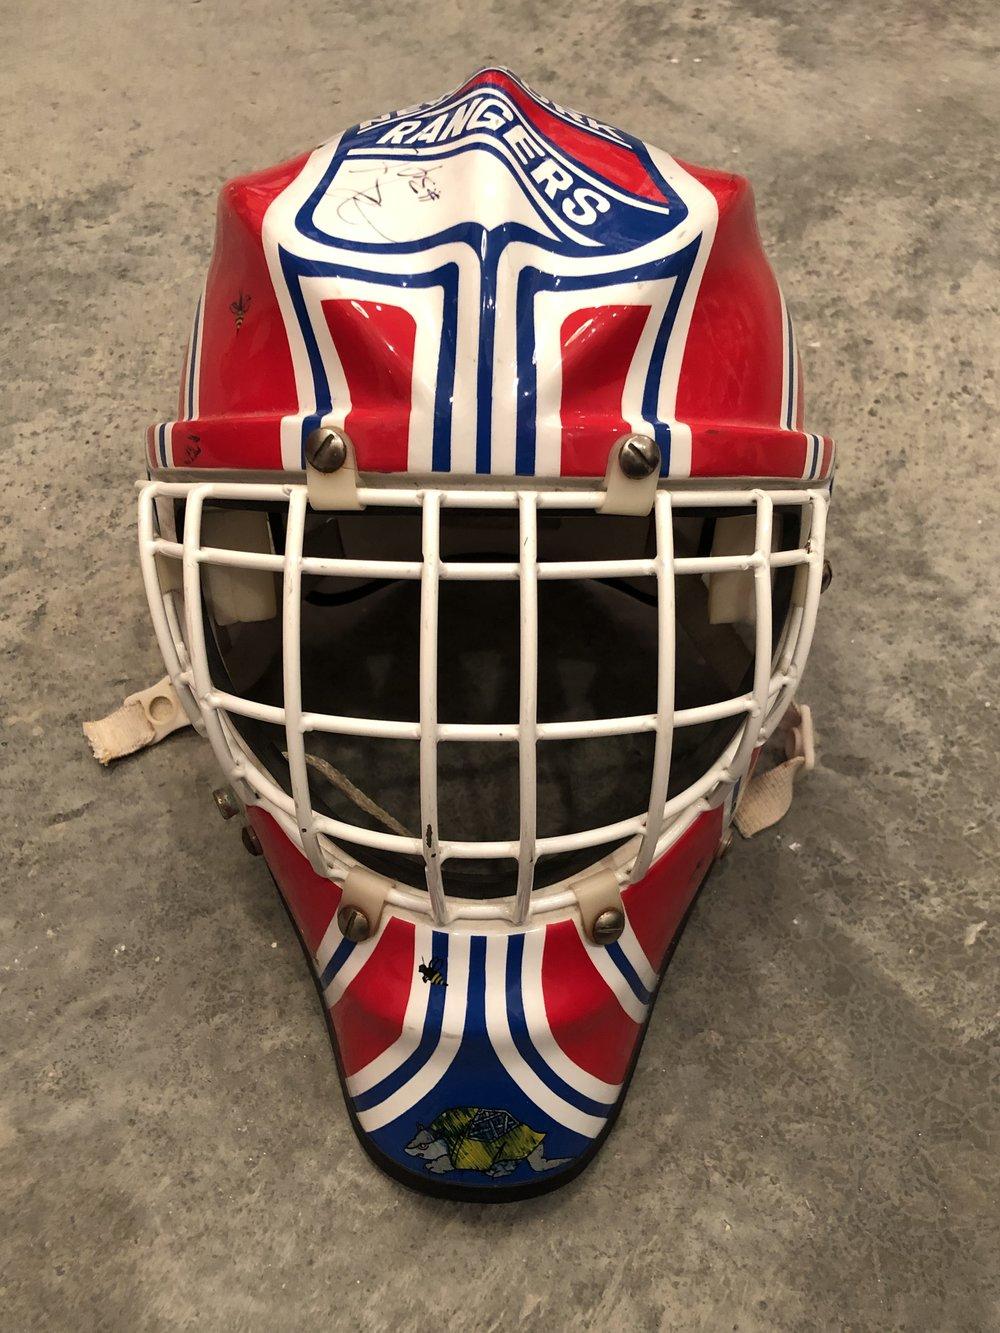 1992-93 John Vanbiesbrouck New York Rangers game worn mask